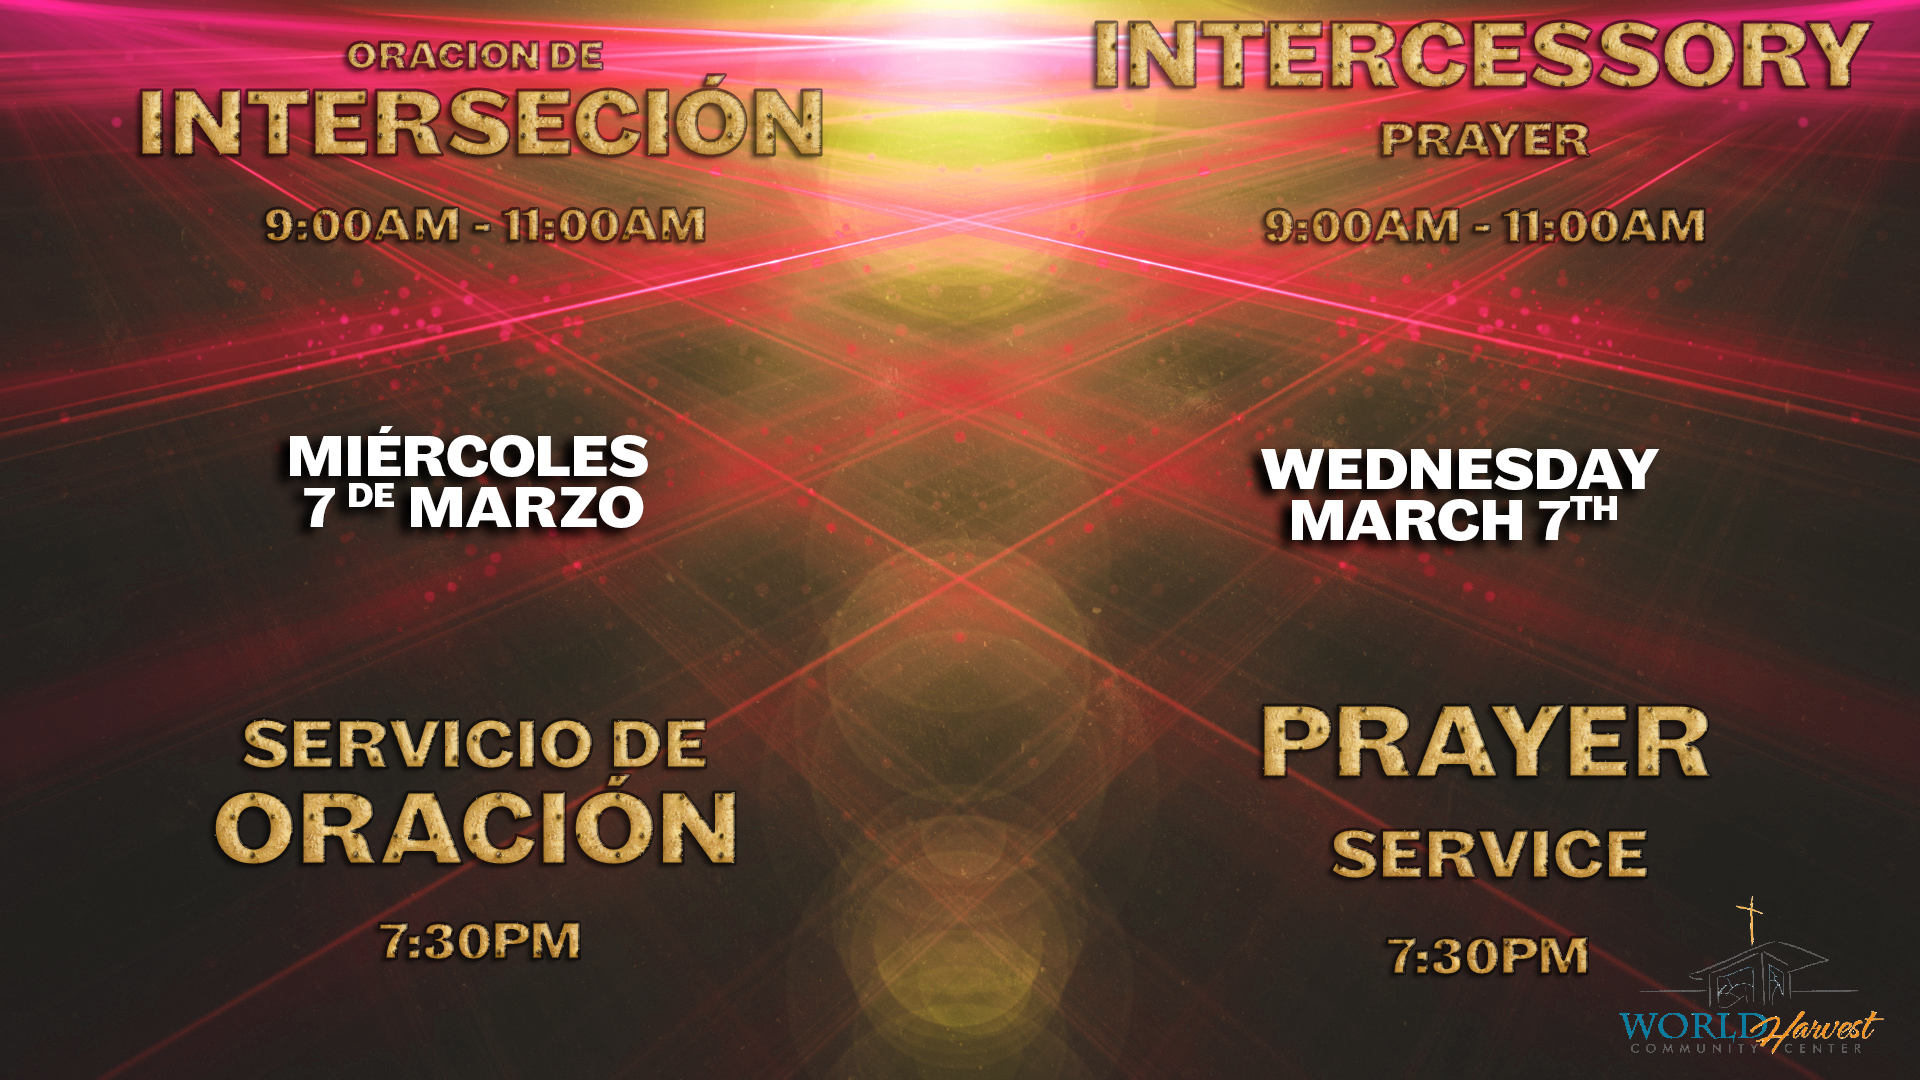 Intercessory & Prayer Service Wed Mar 7th